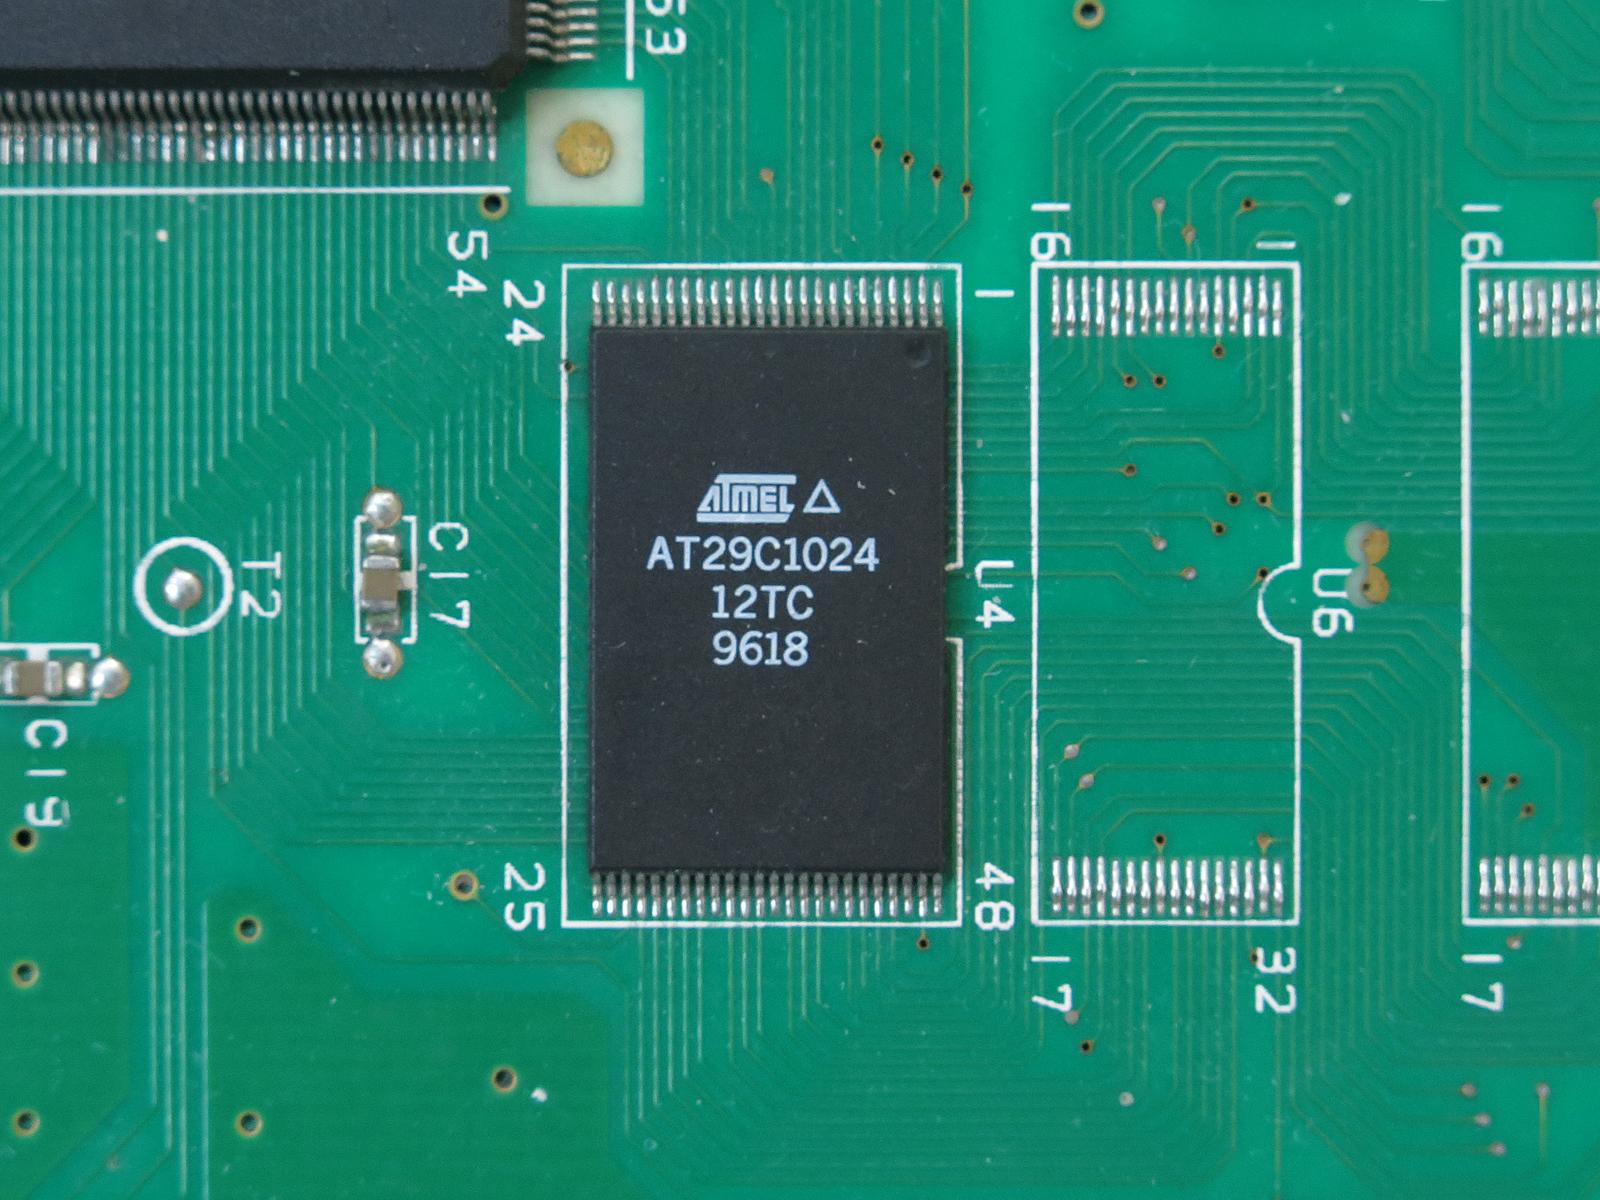 Atmel製フラッシュメモリAT29C1024-70JC